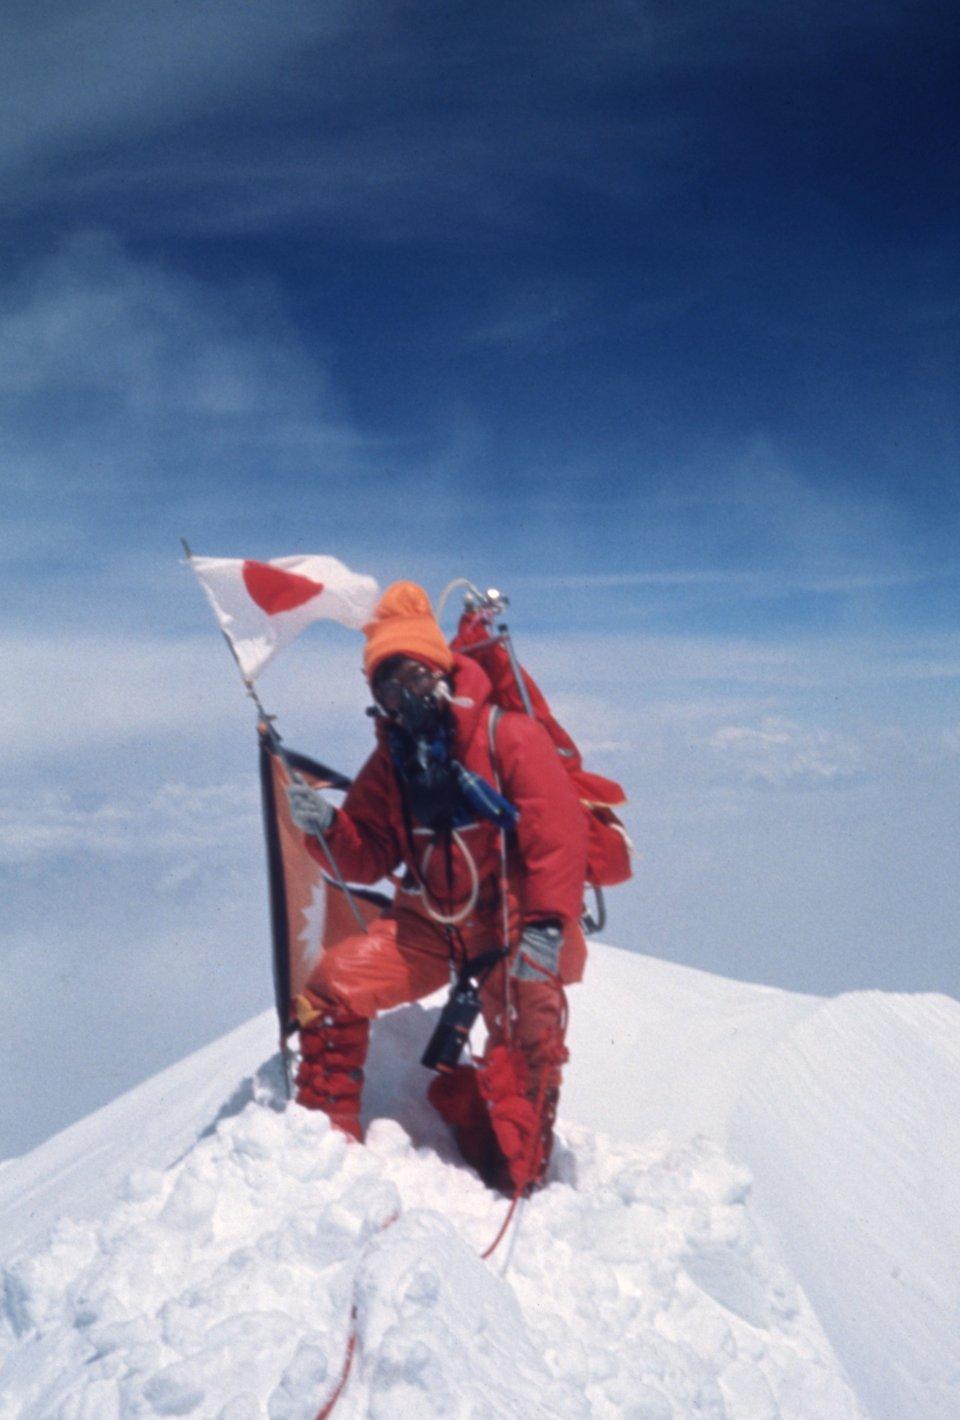 e99658d48370 1975年5月16日午後12時35分、一人の日本人女性が偉業を成し遂げました。田部井淳子氏が女性として世界で初めて、エベレストの頂上に立ったのです。